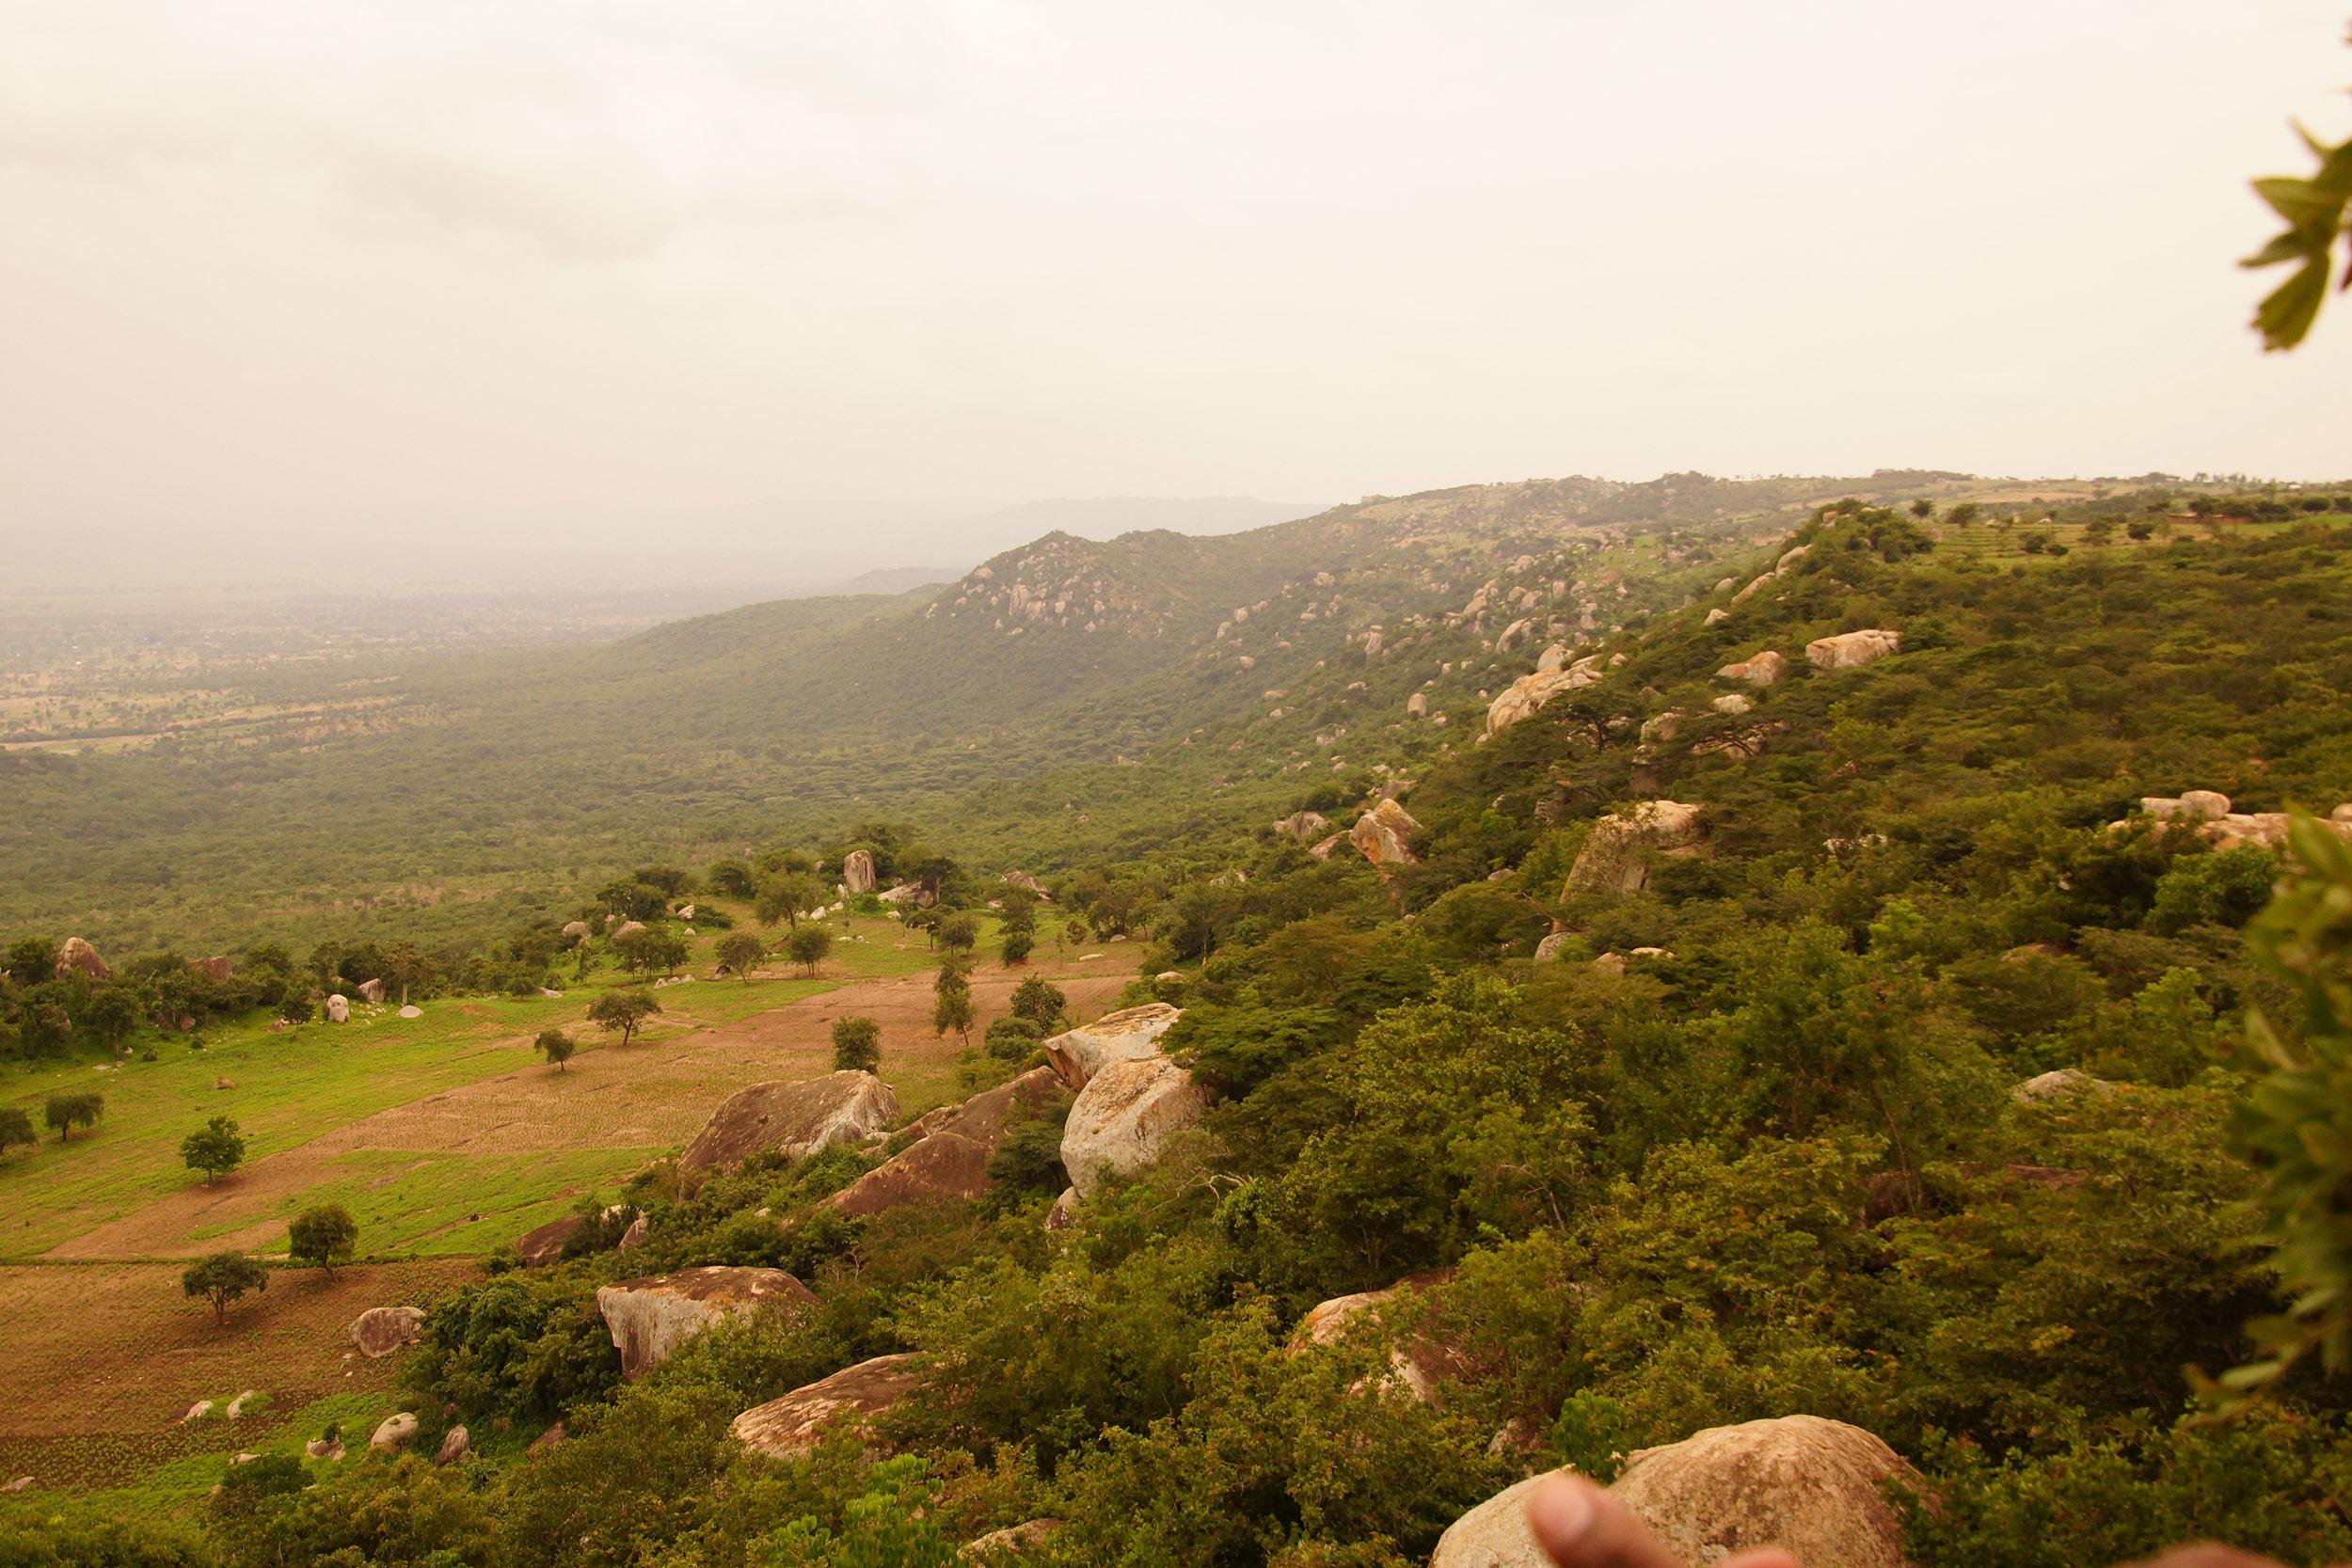 The windy Rift Valley Escarpment in Singida, Tanzania